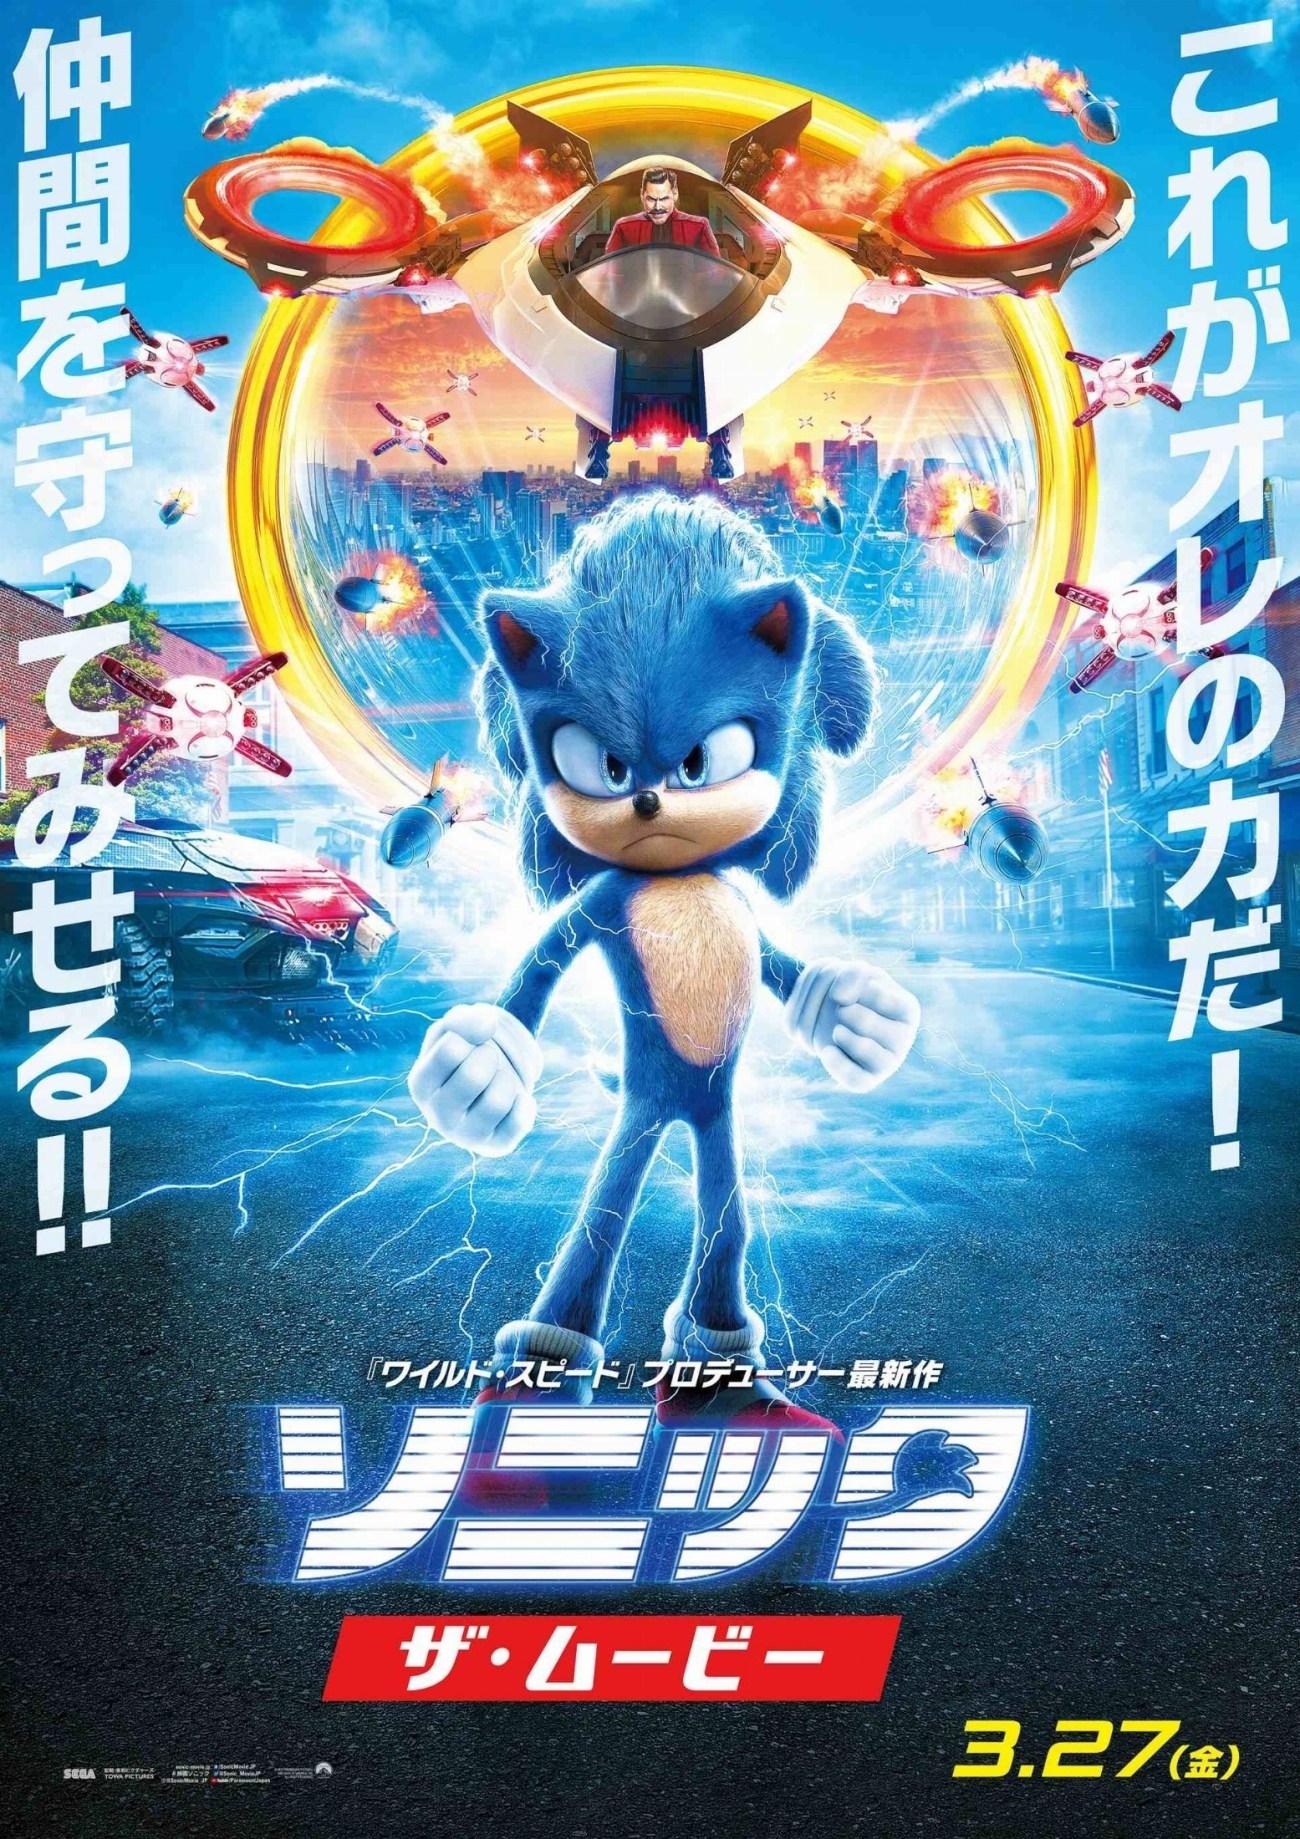 Póster japonés de Sonic the Hedgehog (2020). Imagen: impawards.com